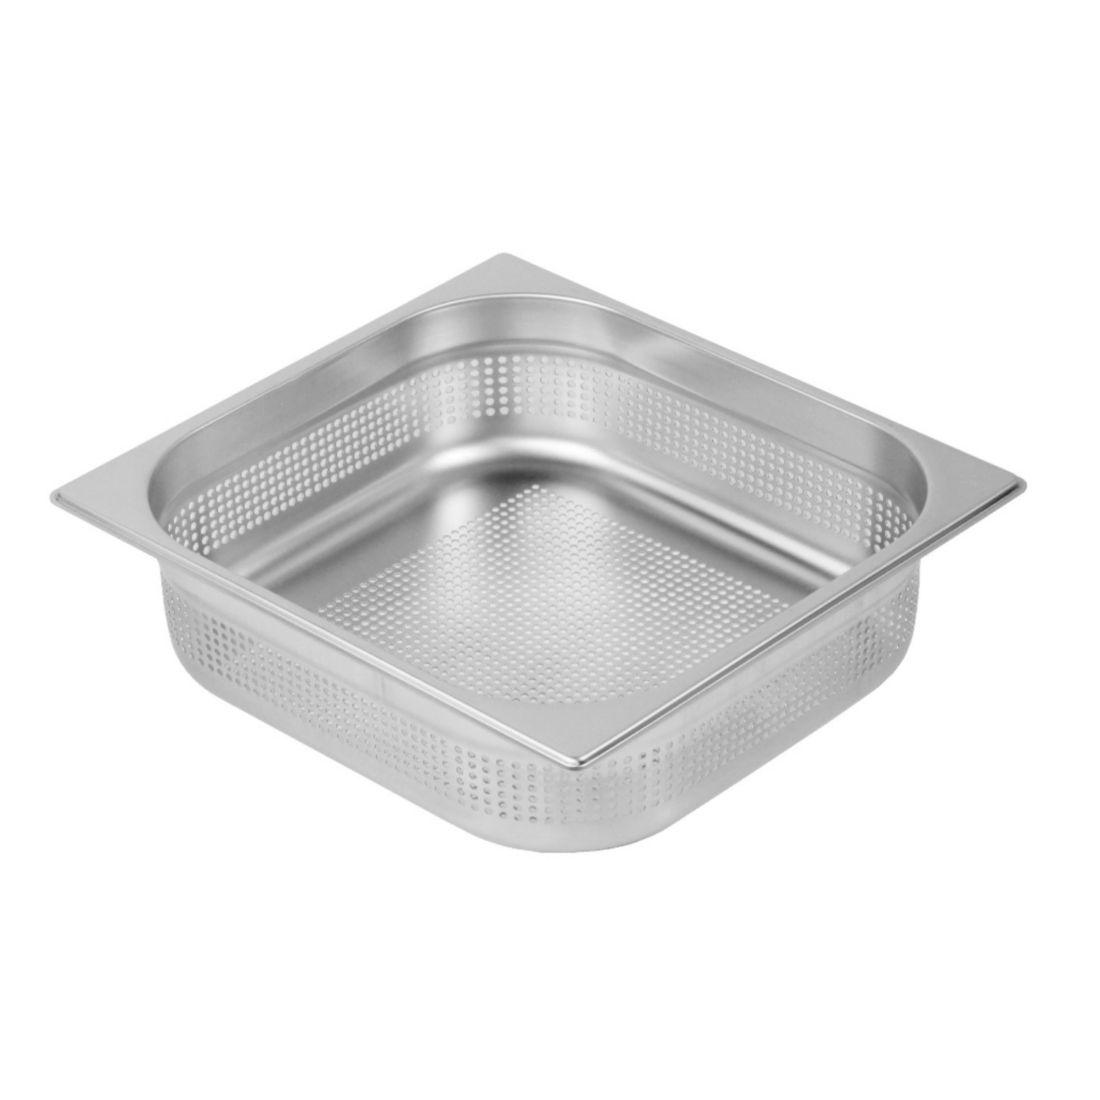 Gastronádoba perforovaná GN 2/3 065 mm